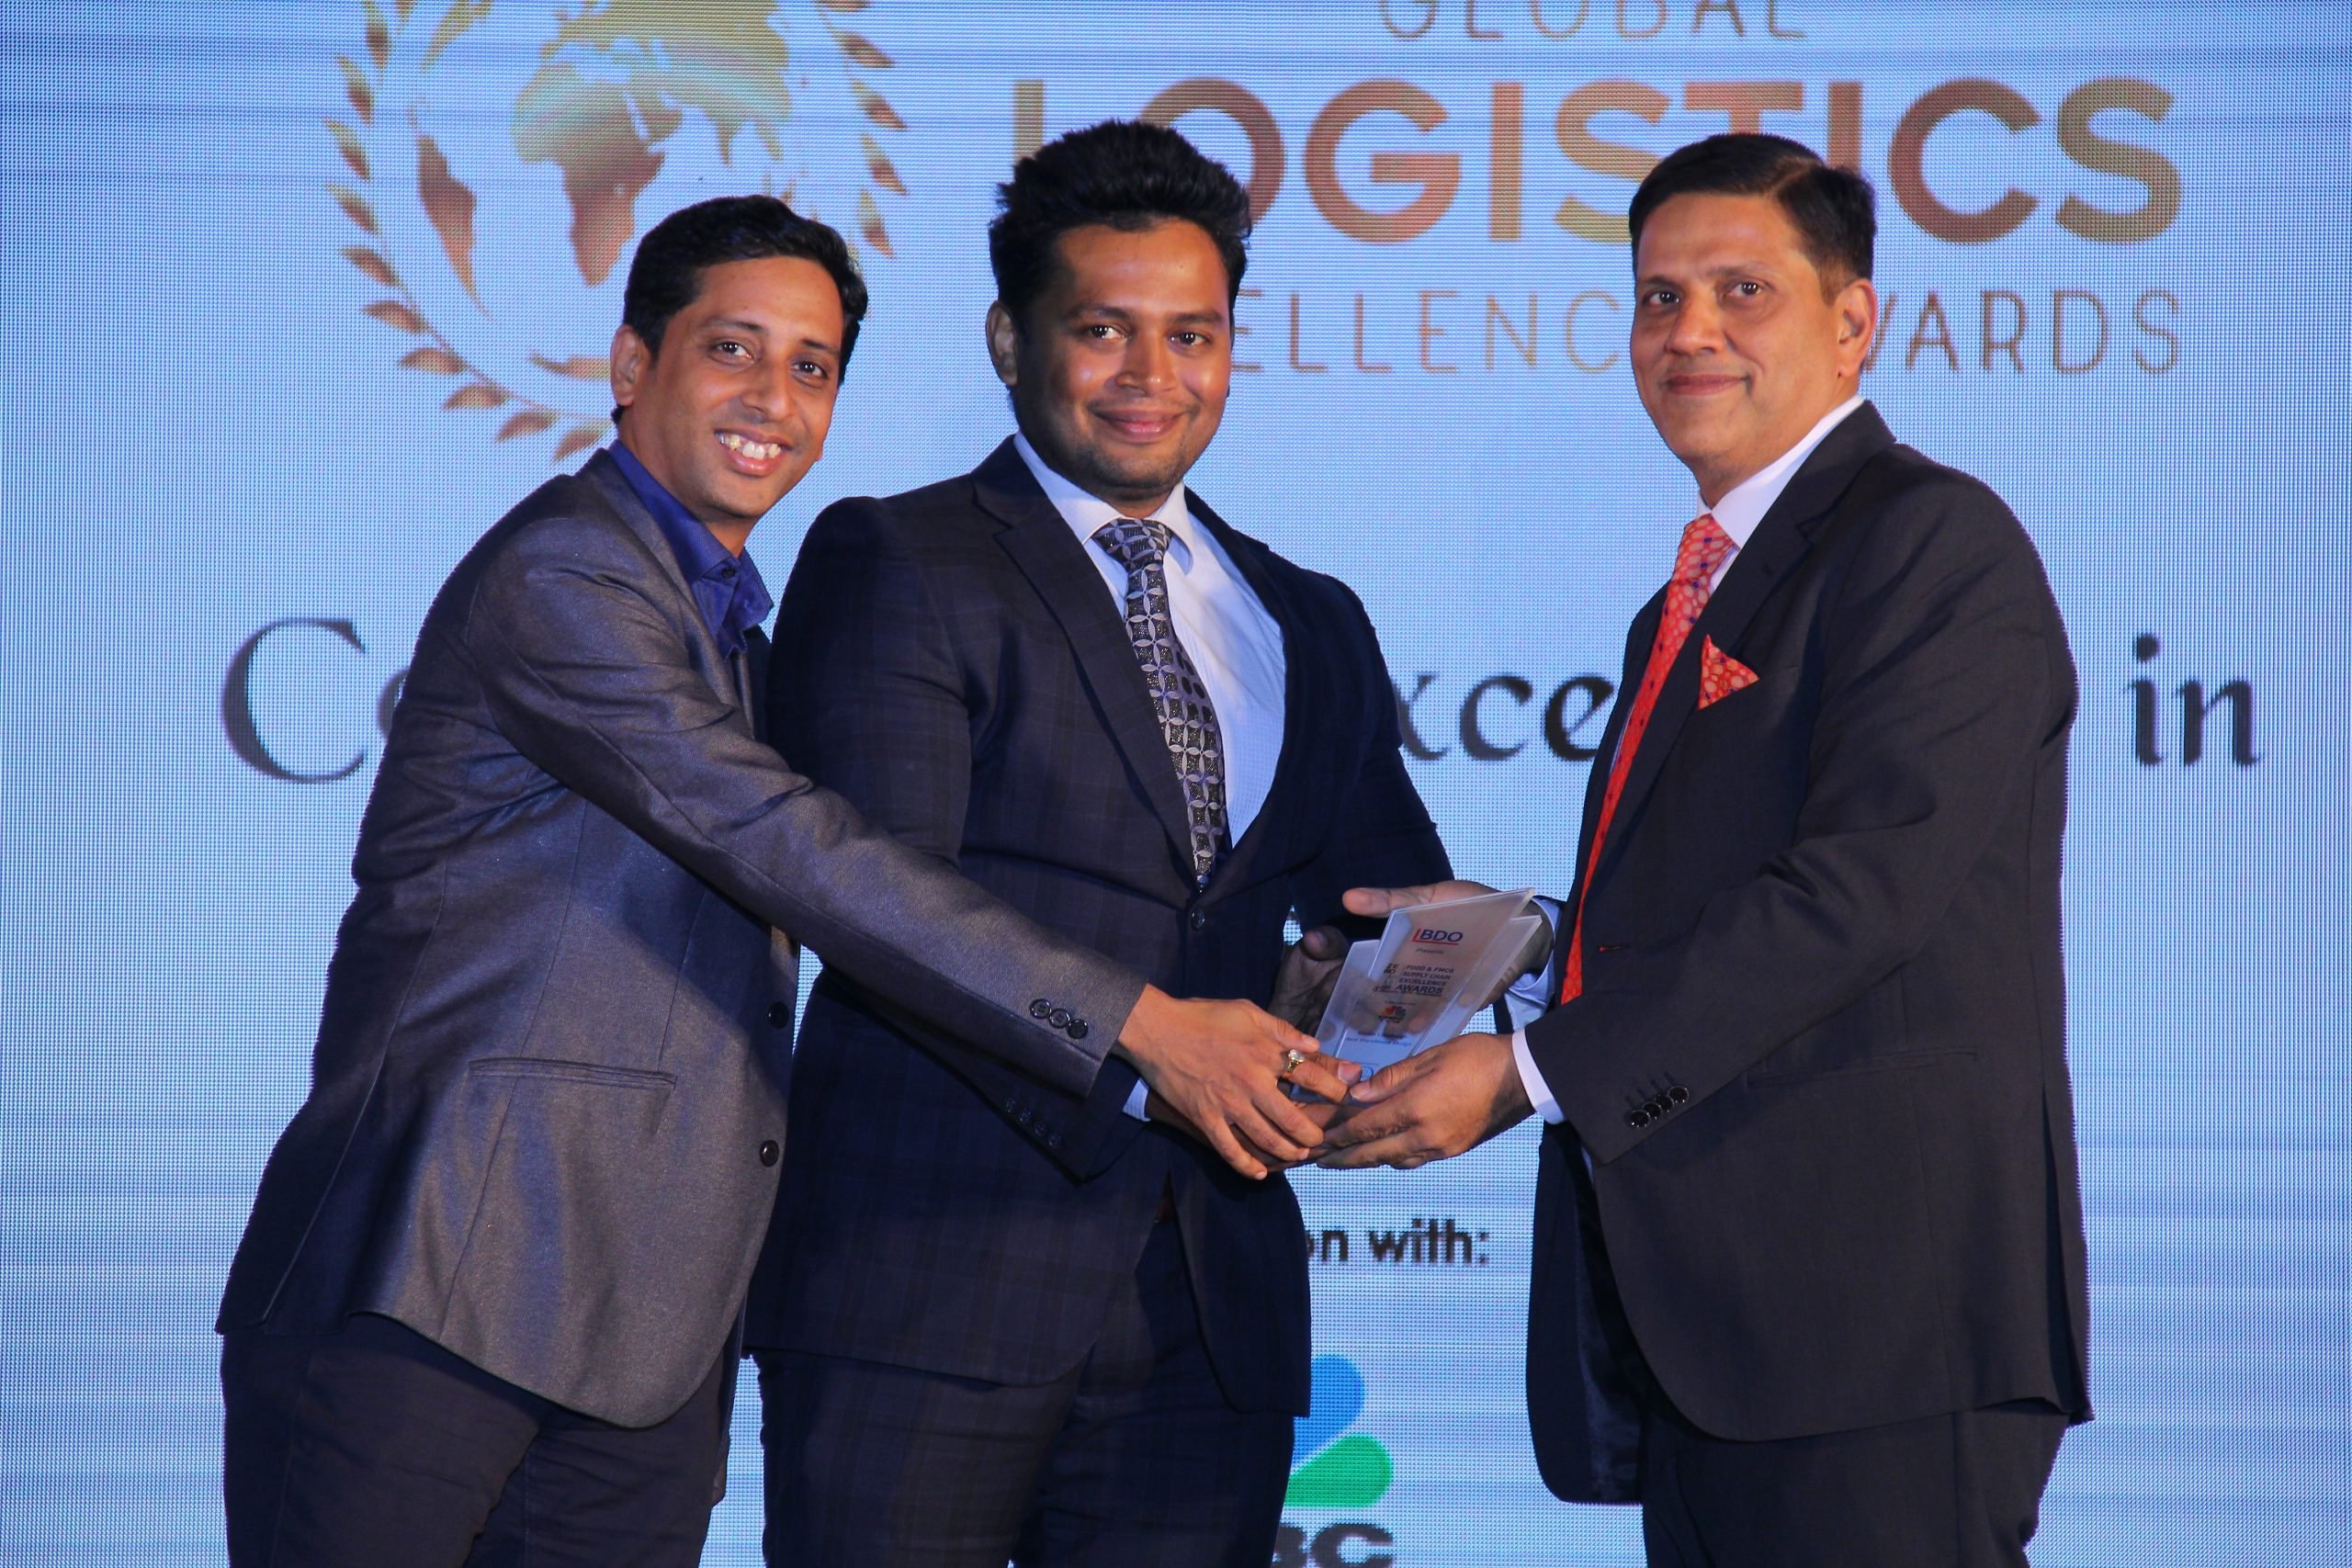 CNBC Global Logistics Award 2019